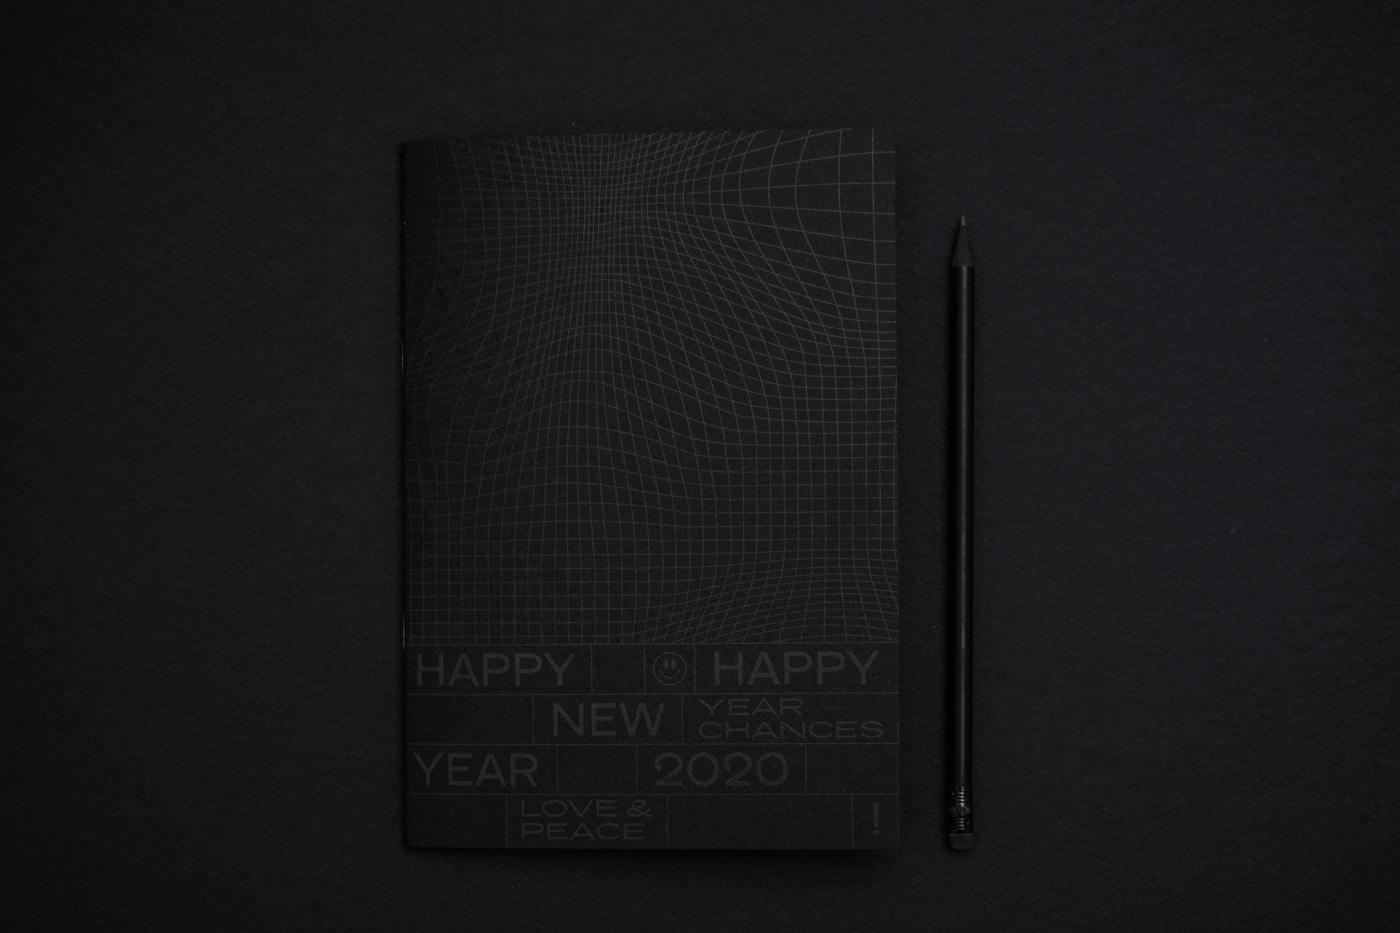 Notizbuch_Design_Studio-Pala_2019_5349